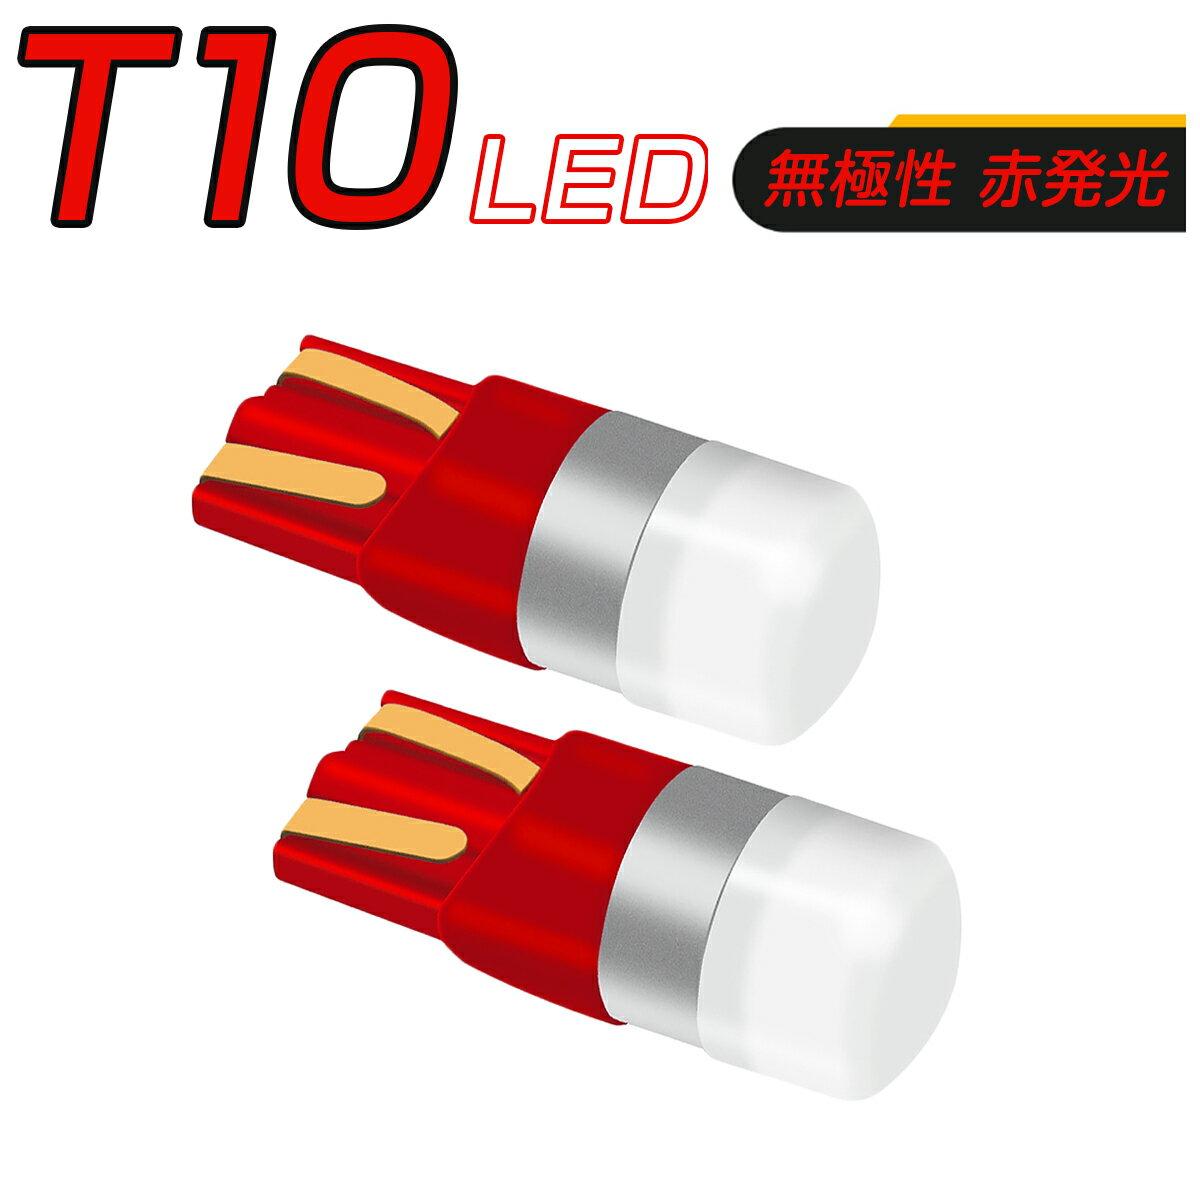 TOYOTA ポルテ(minor後) H19.6〜H24.5 NNP1# ハイマウントストップ[T16]赤色 LED 赤 T10 T13 T15 T16 キャンセラー付き 12V/24V 無極性 2個セット メール便送料無料 3ヶ月保証 K&M